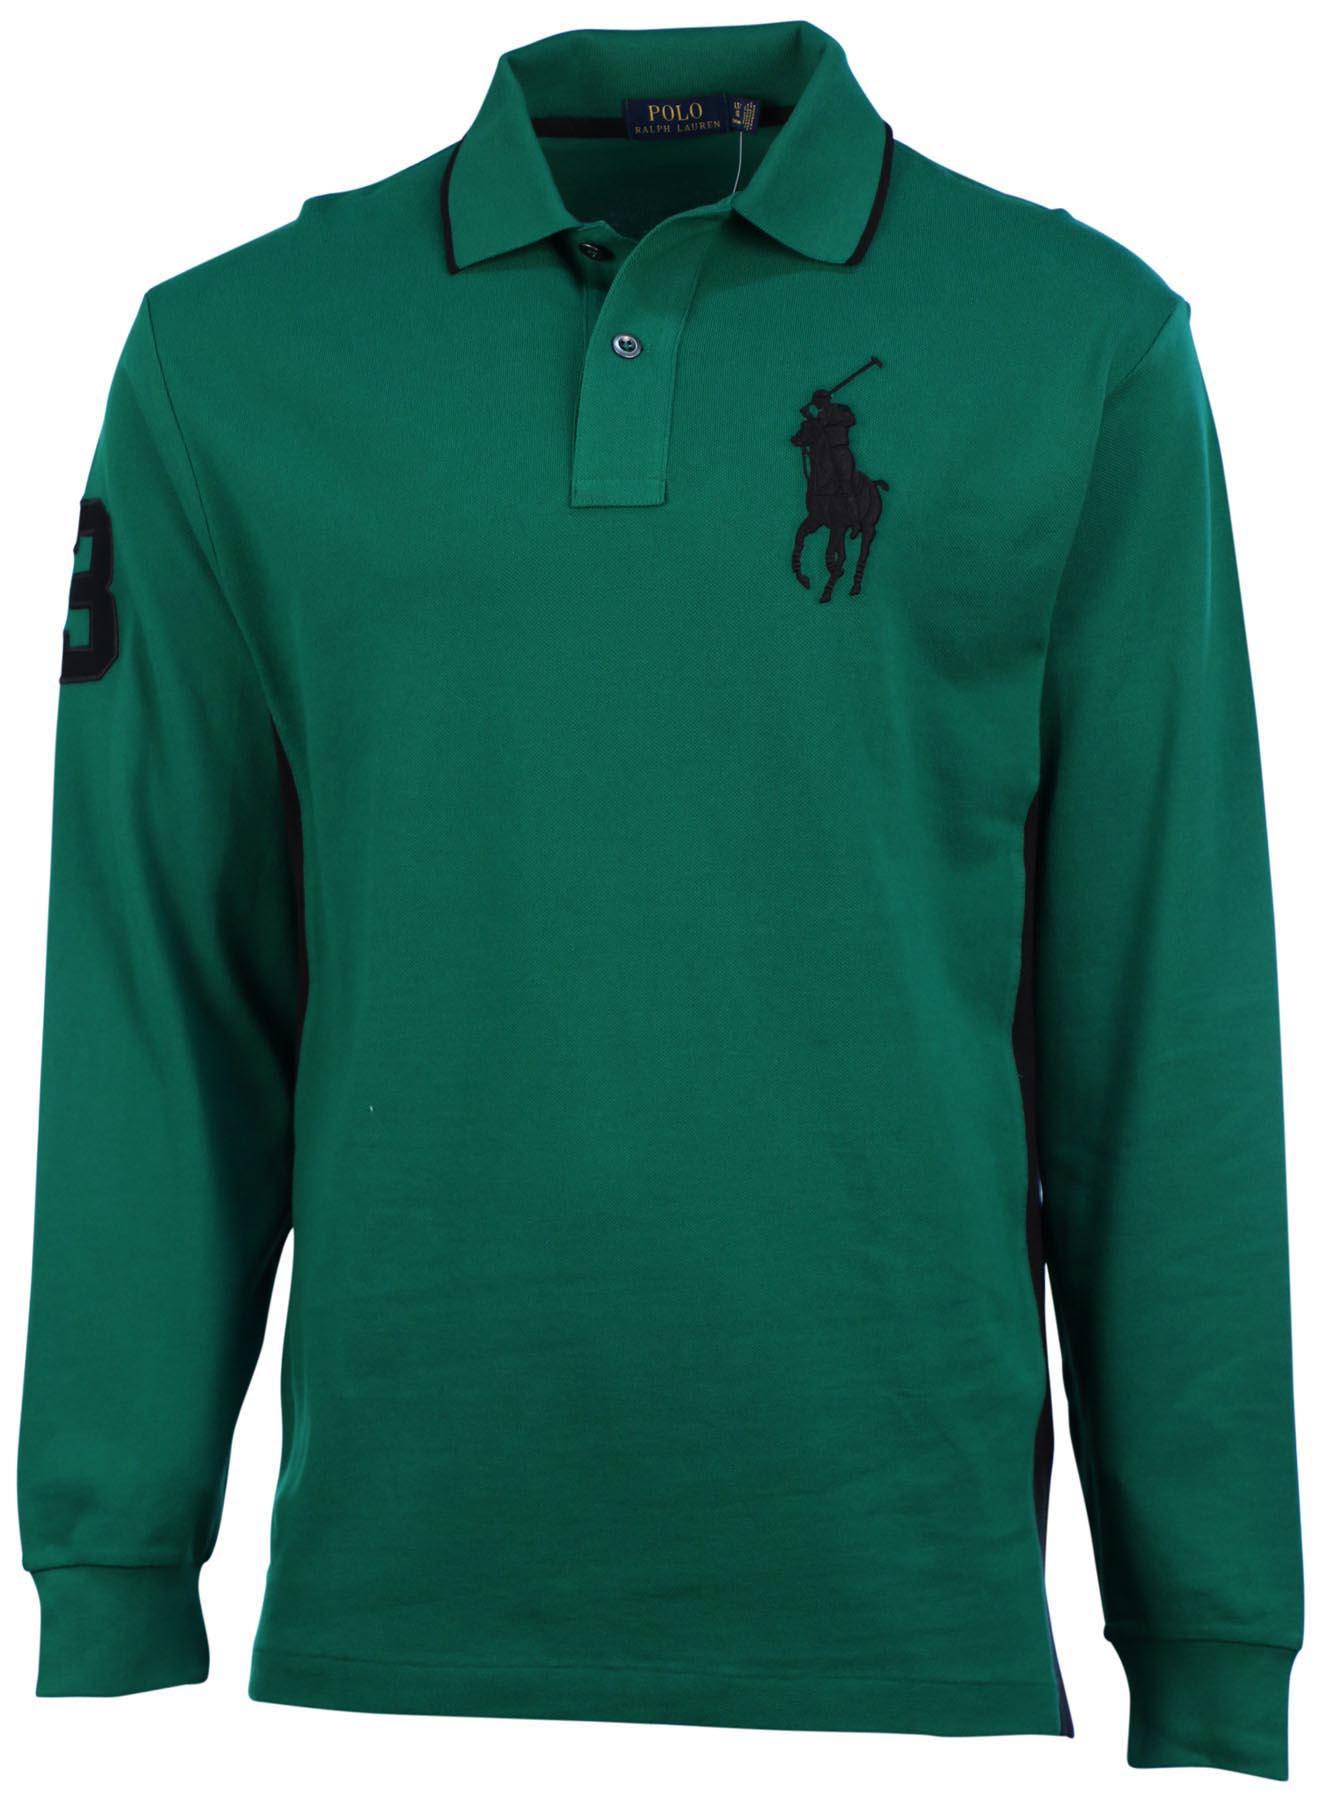 Polo ralph lauren men 39 s big tall l s big pony knit shirt for Men s big tall shirts